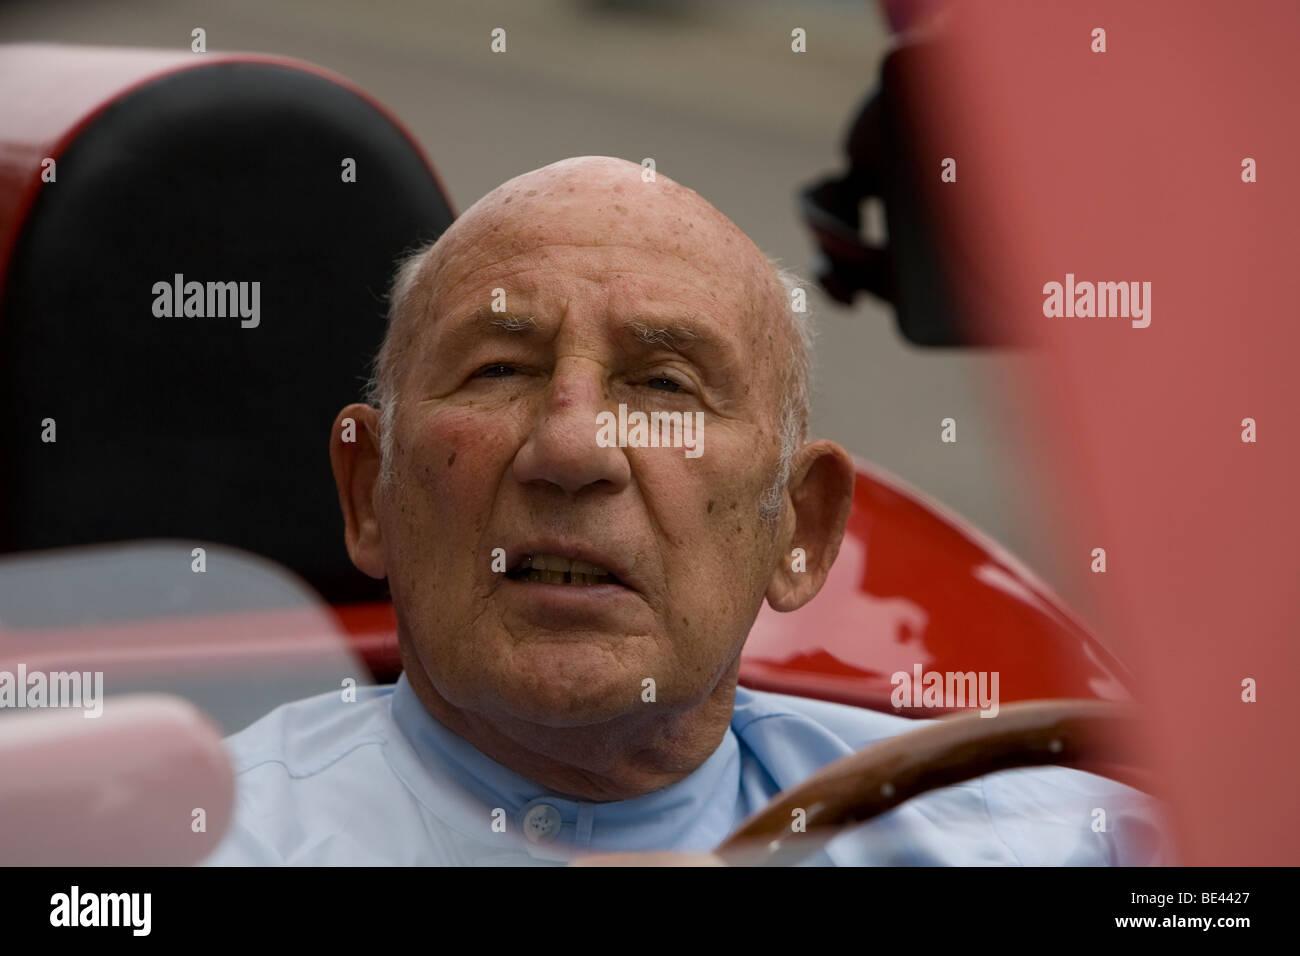 Sir Stirling Moss in seinen OSCA FS372 am Goodwood Revival 2009. Sir Stirling feierte seinen 80. Geburtstag hier Stockbild